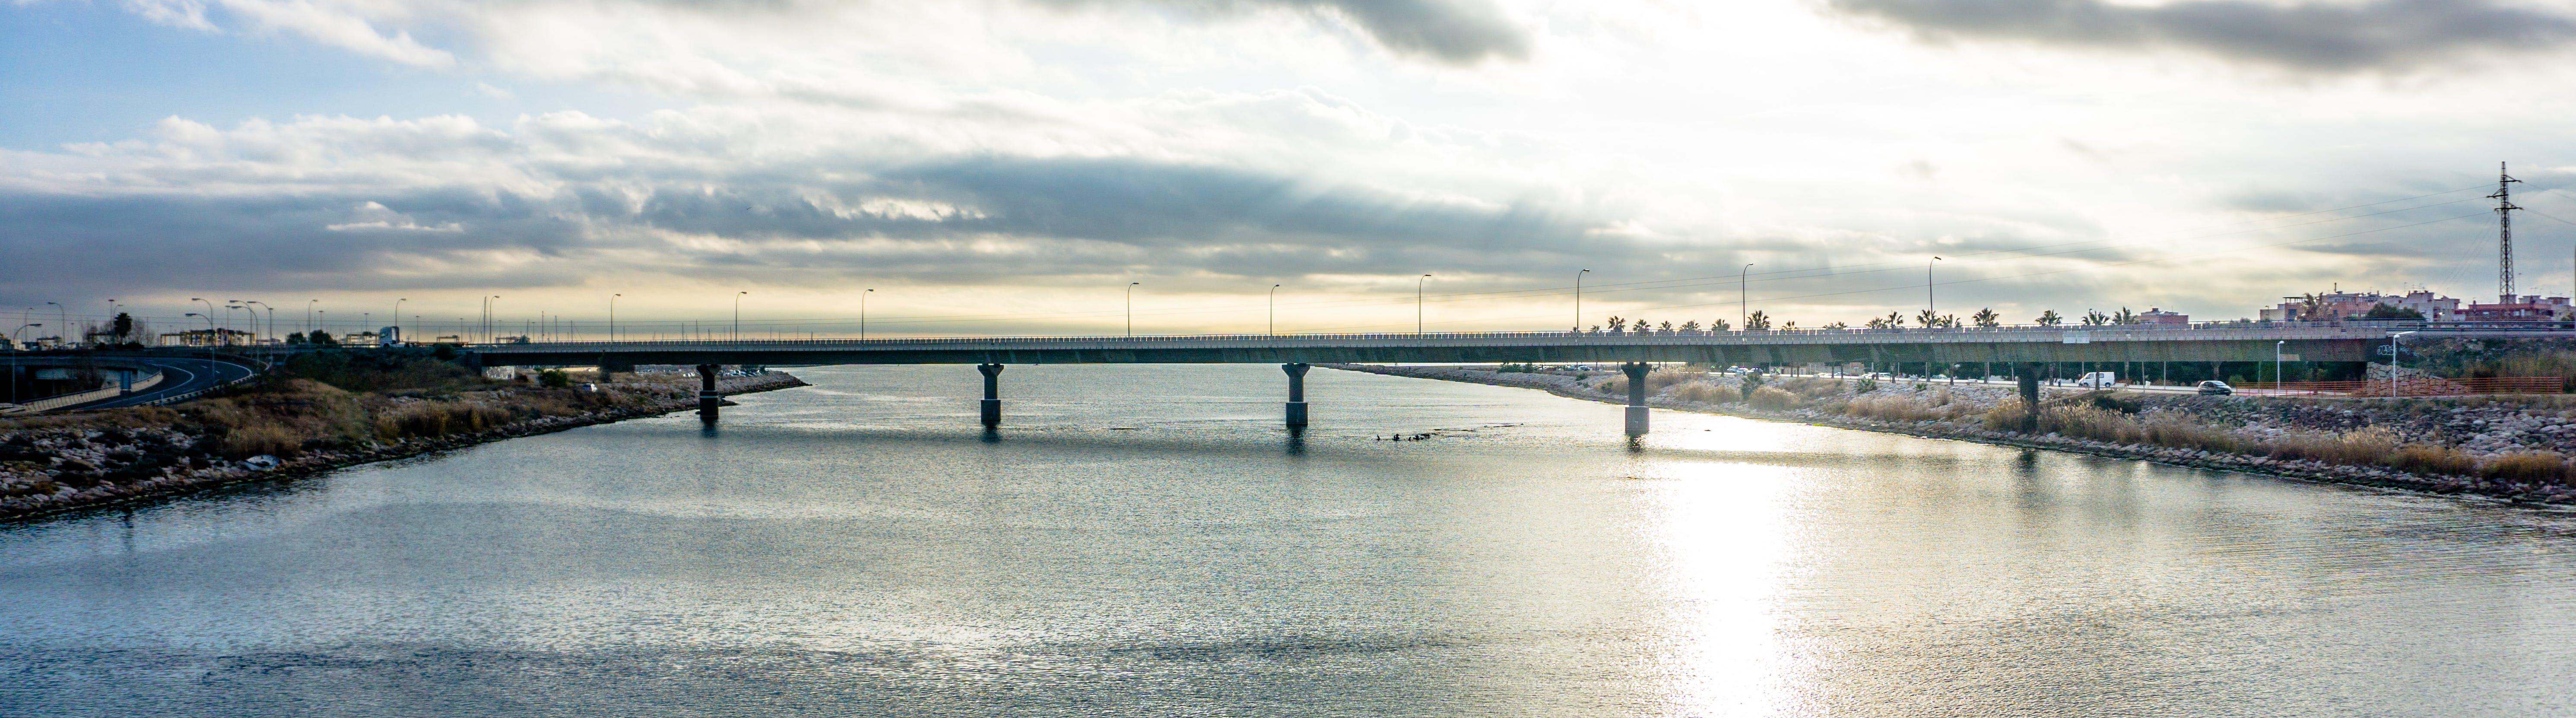 Panoramic Photography of Bridge Under Cloudy Sky